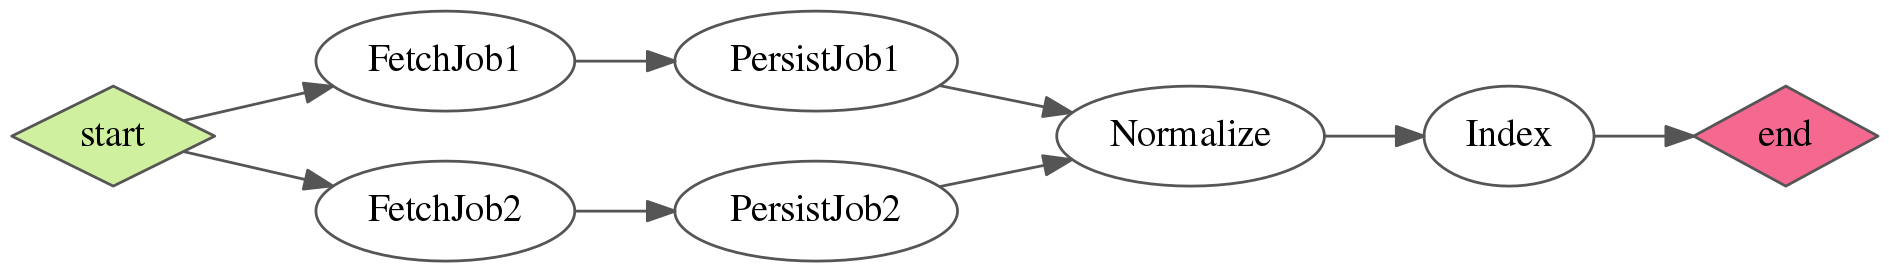 SampleWorkflow